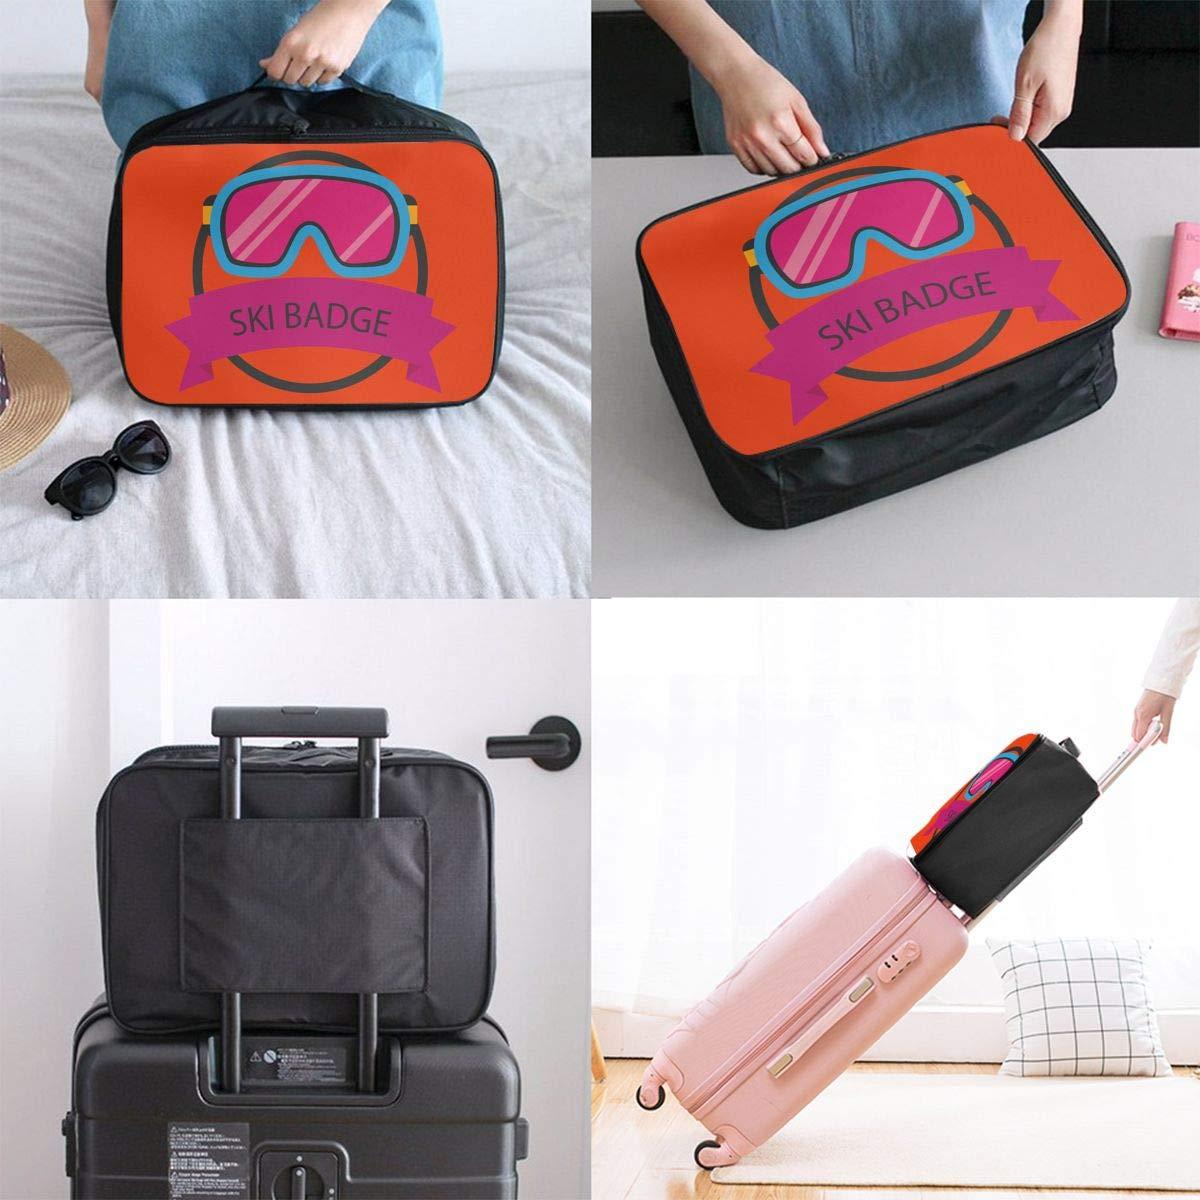 Travel Luggage Duffle Bag Lightweight Portable Handbag Ski Badge Large Capacity Waterproof Foldable Storage Tote